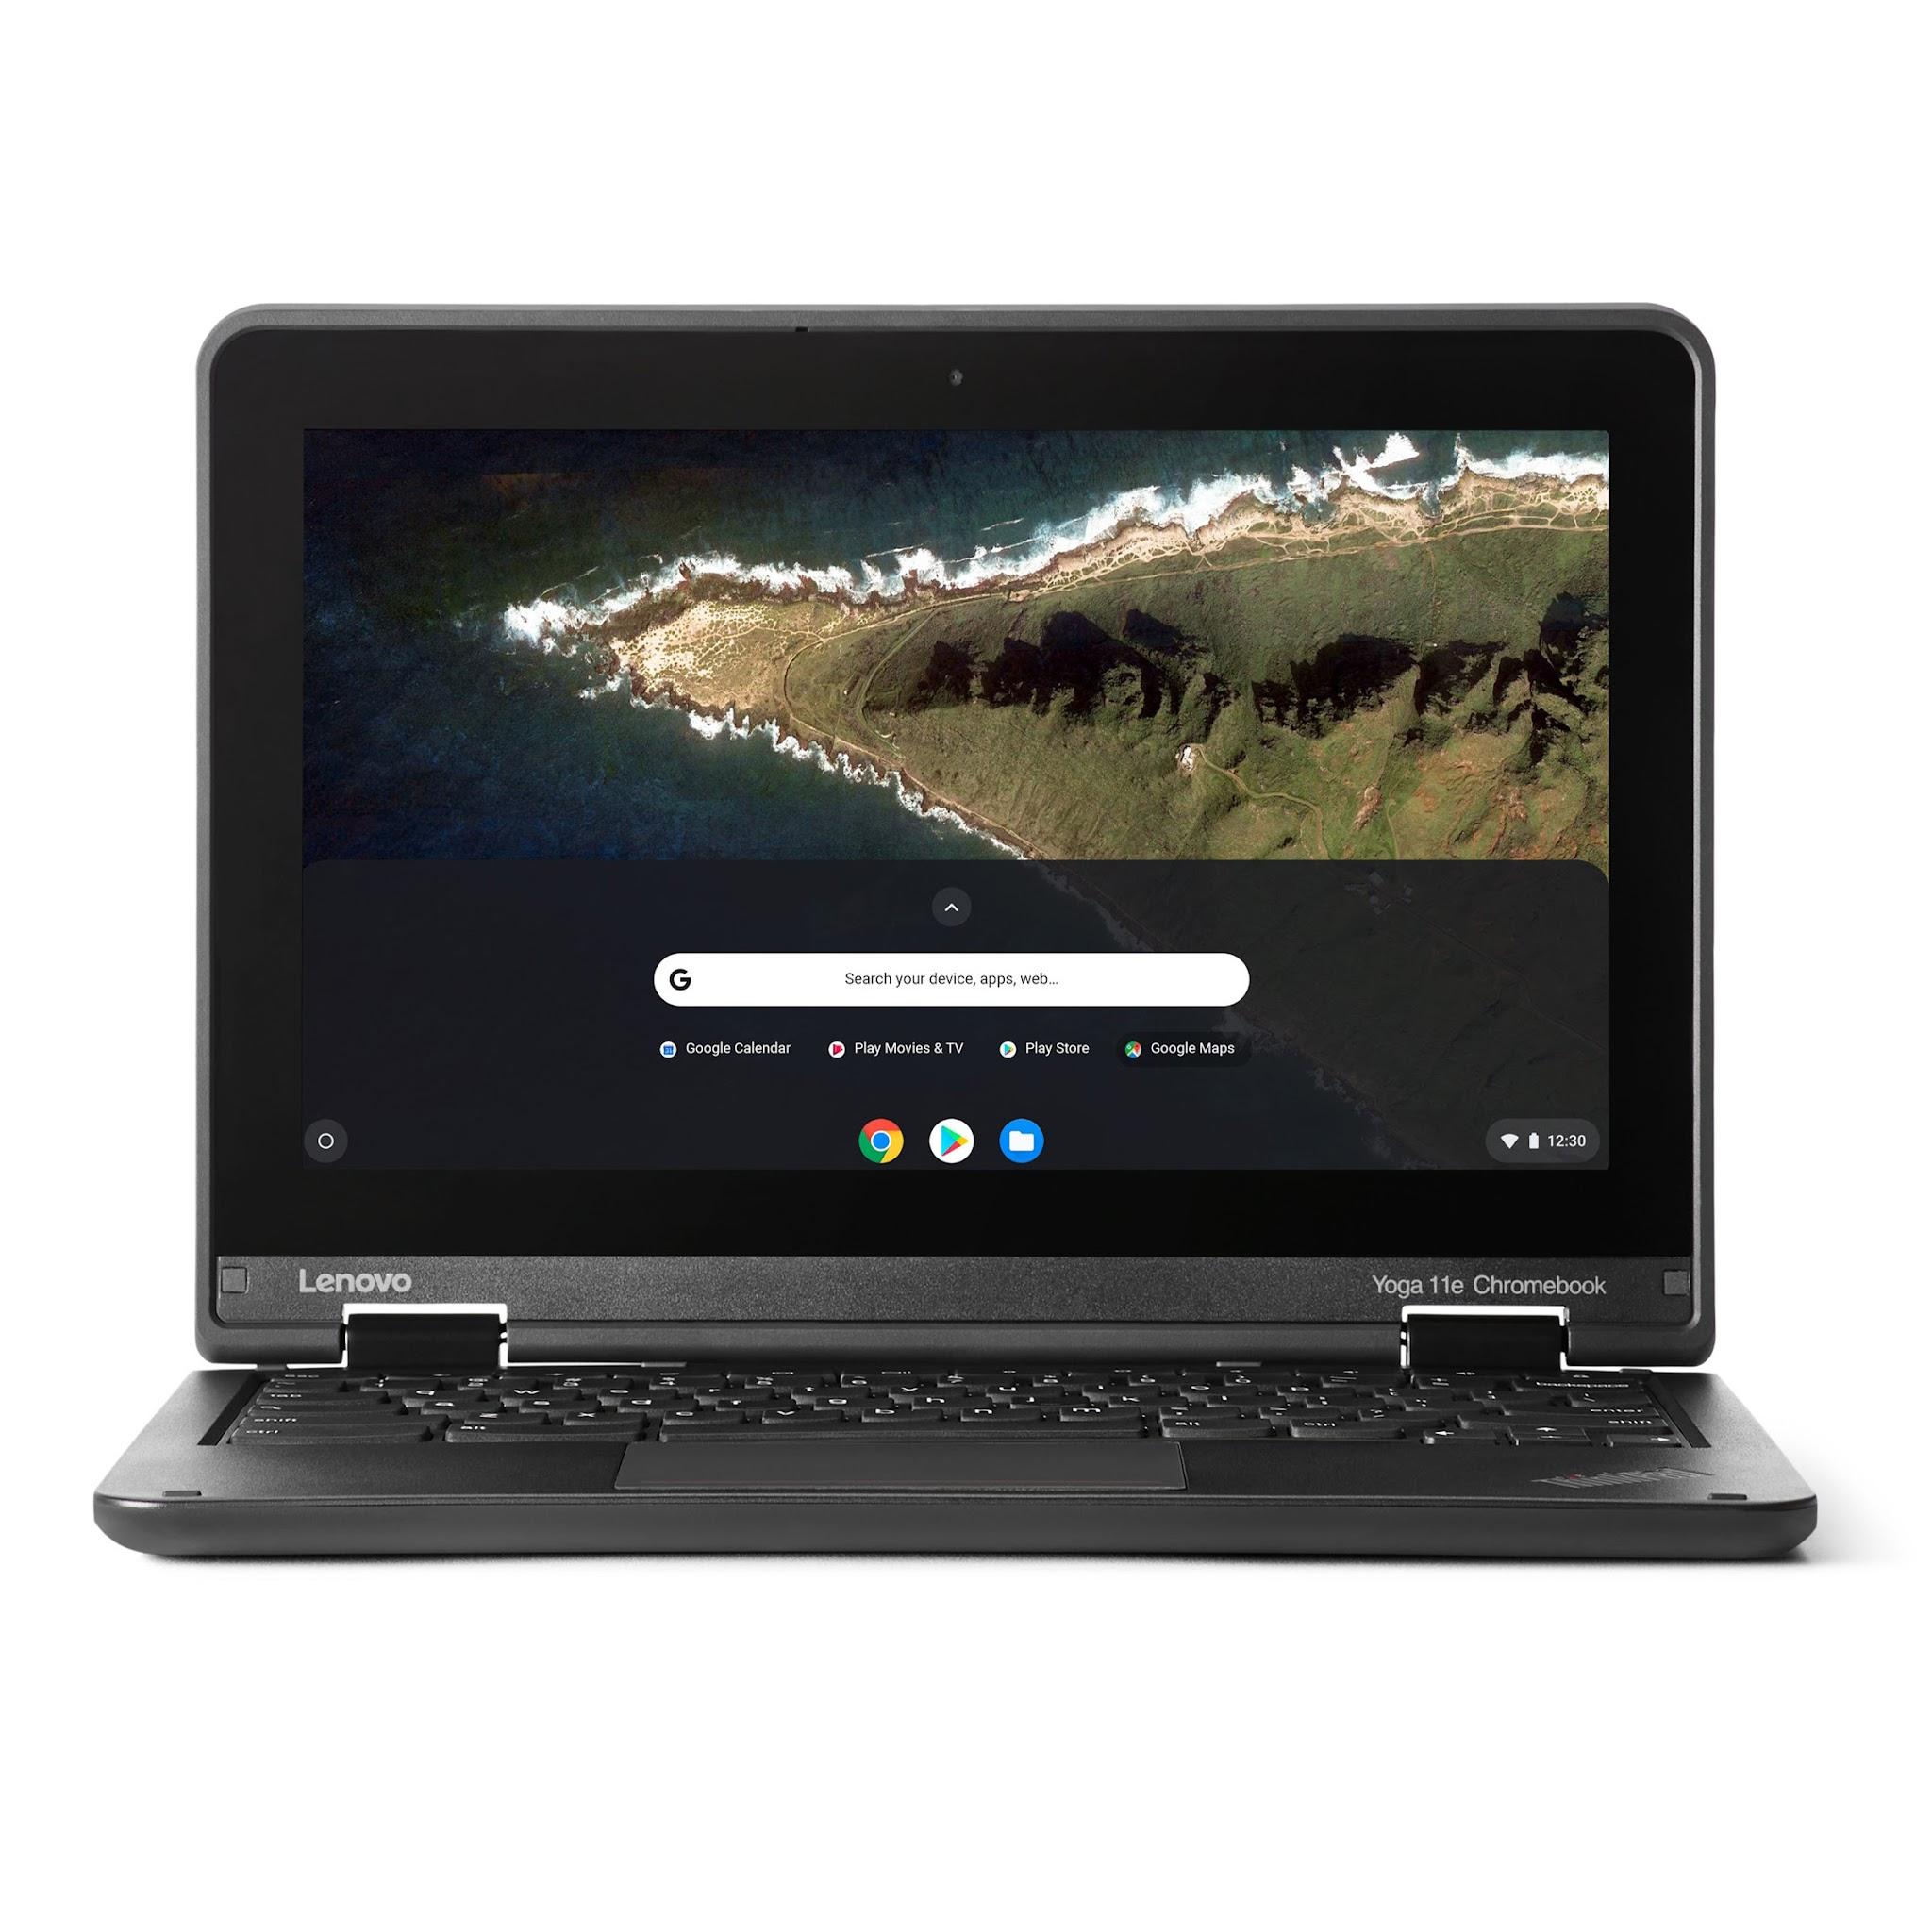 Lenovo Thinkpad 11e Yoga Chromebook - photo 1